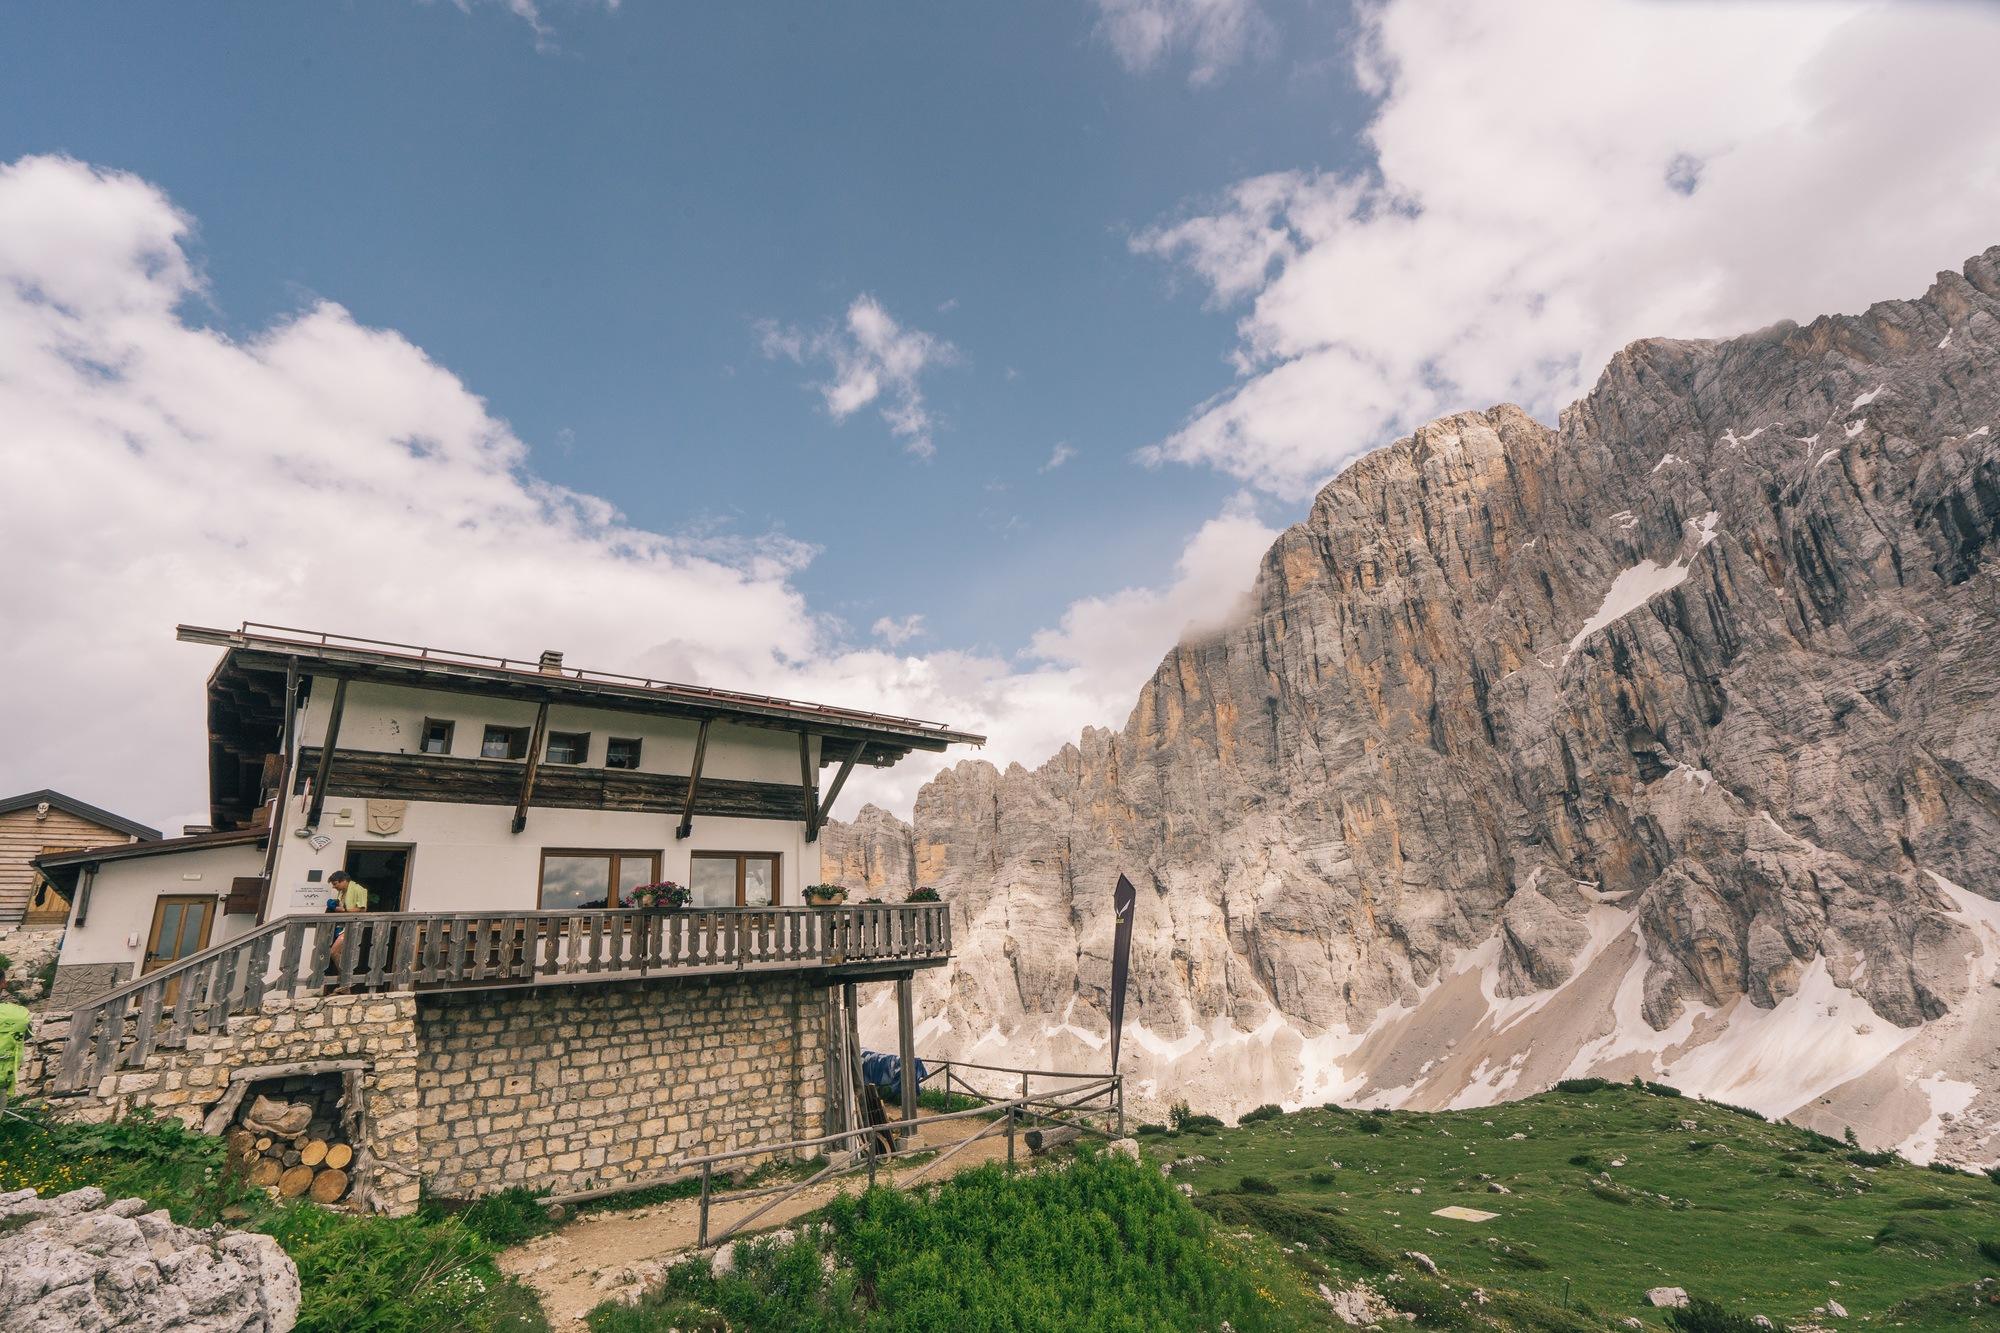 rifugios in the dolomites